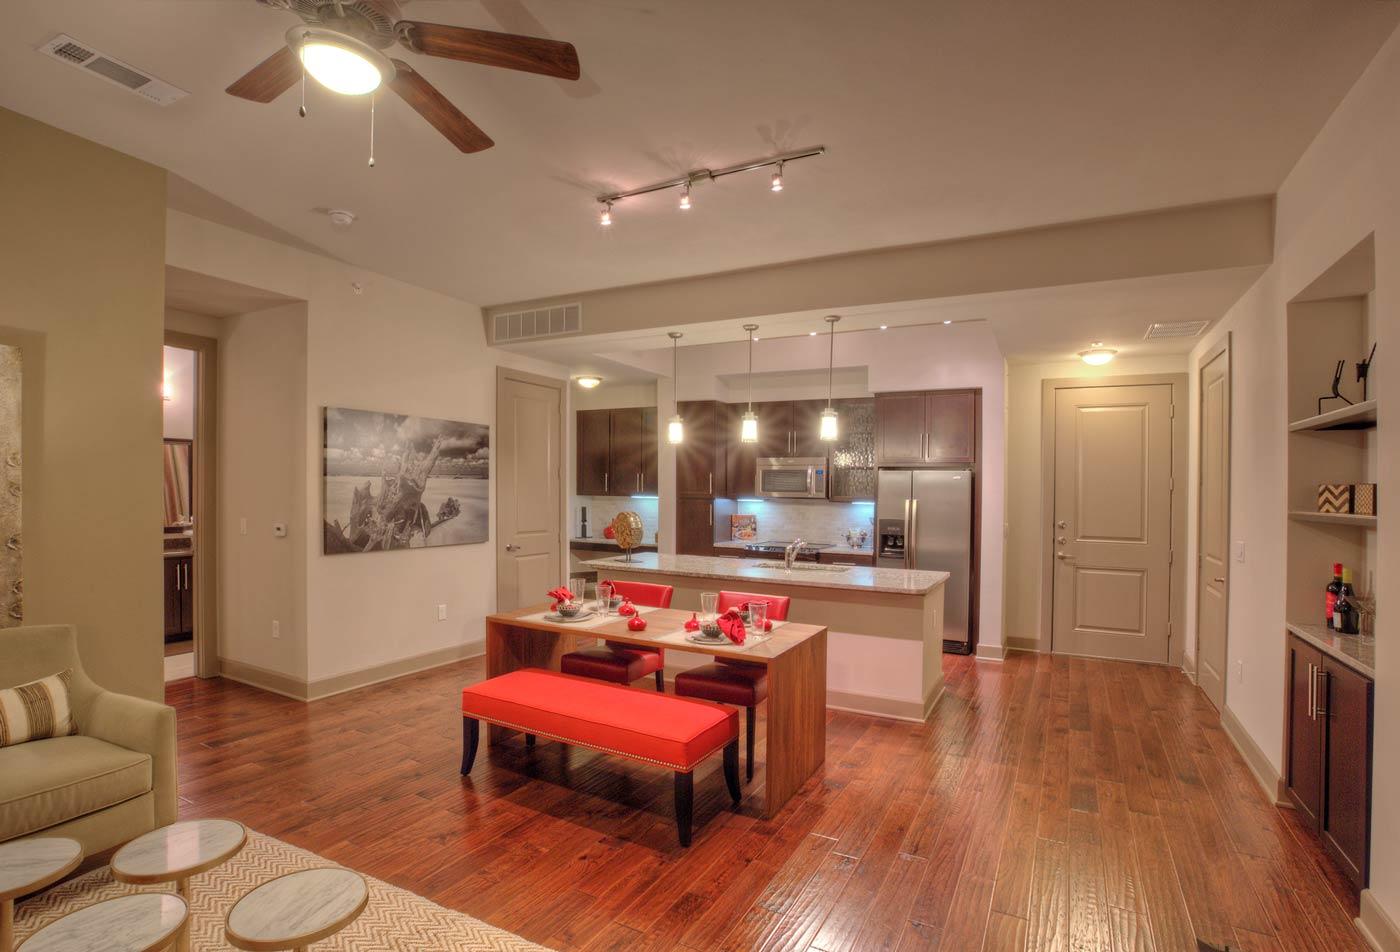 ALARA Uptown | apartments Dallas TX | Spacious Dining Room